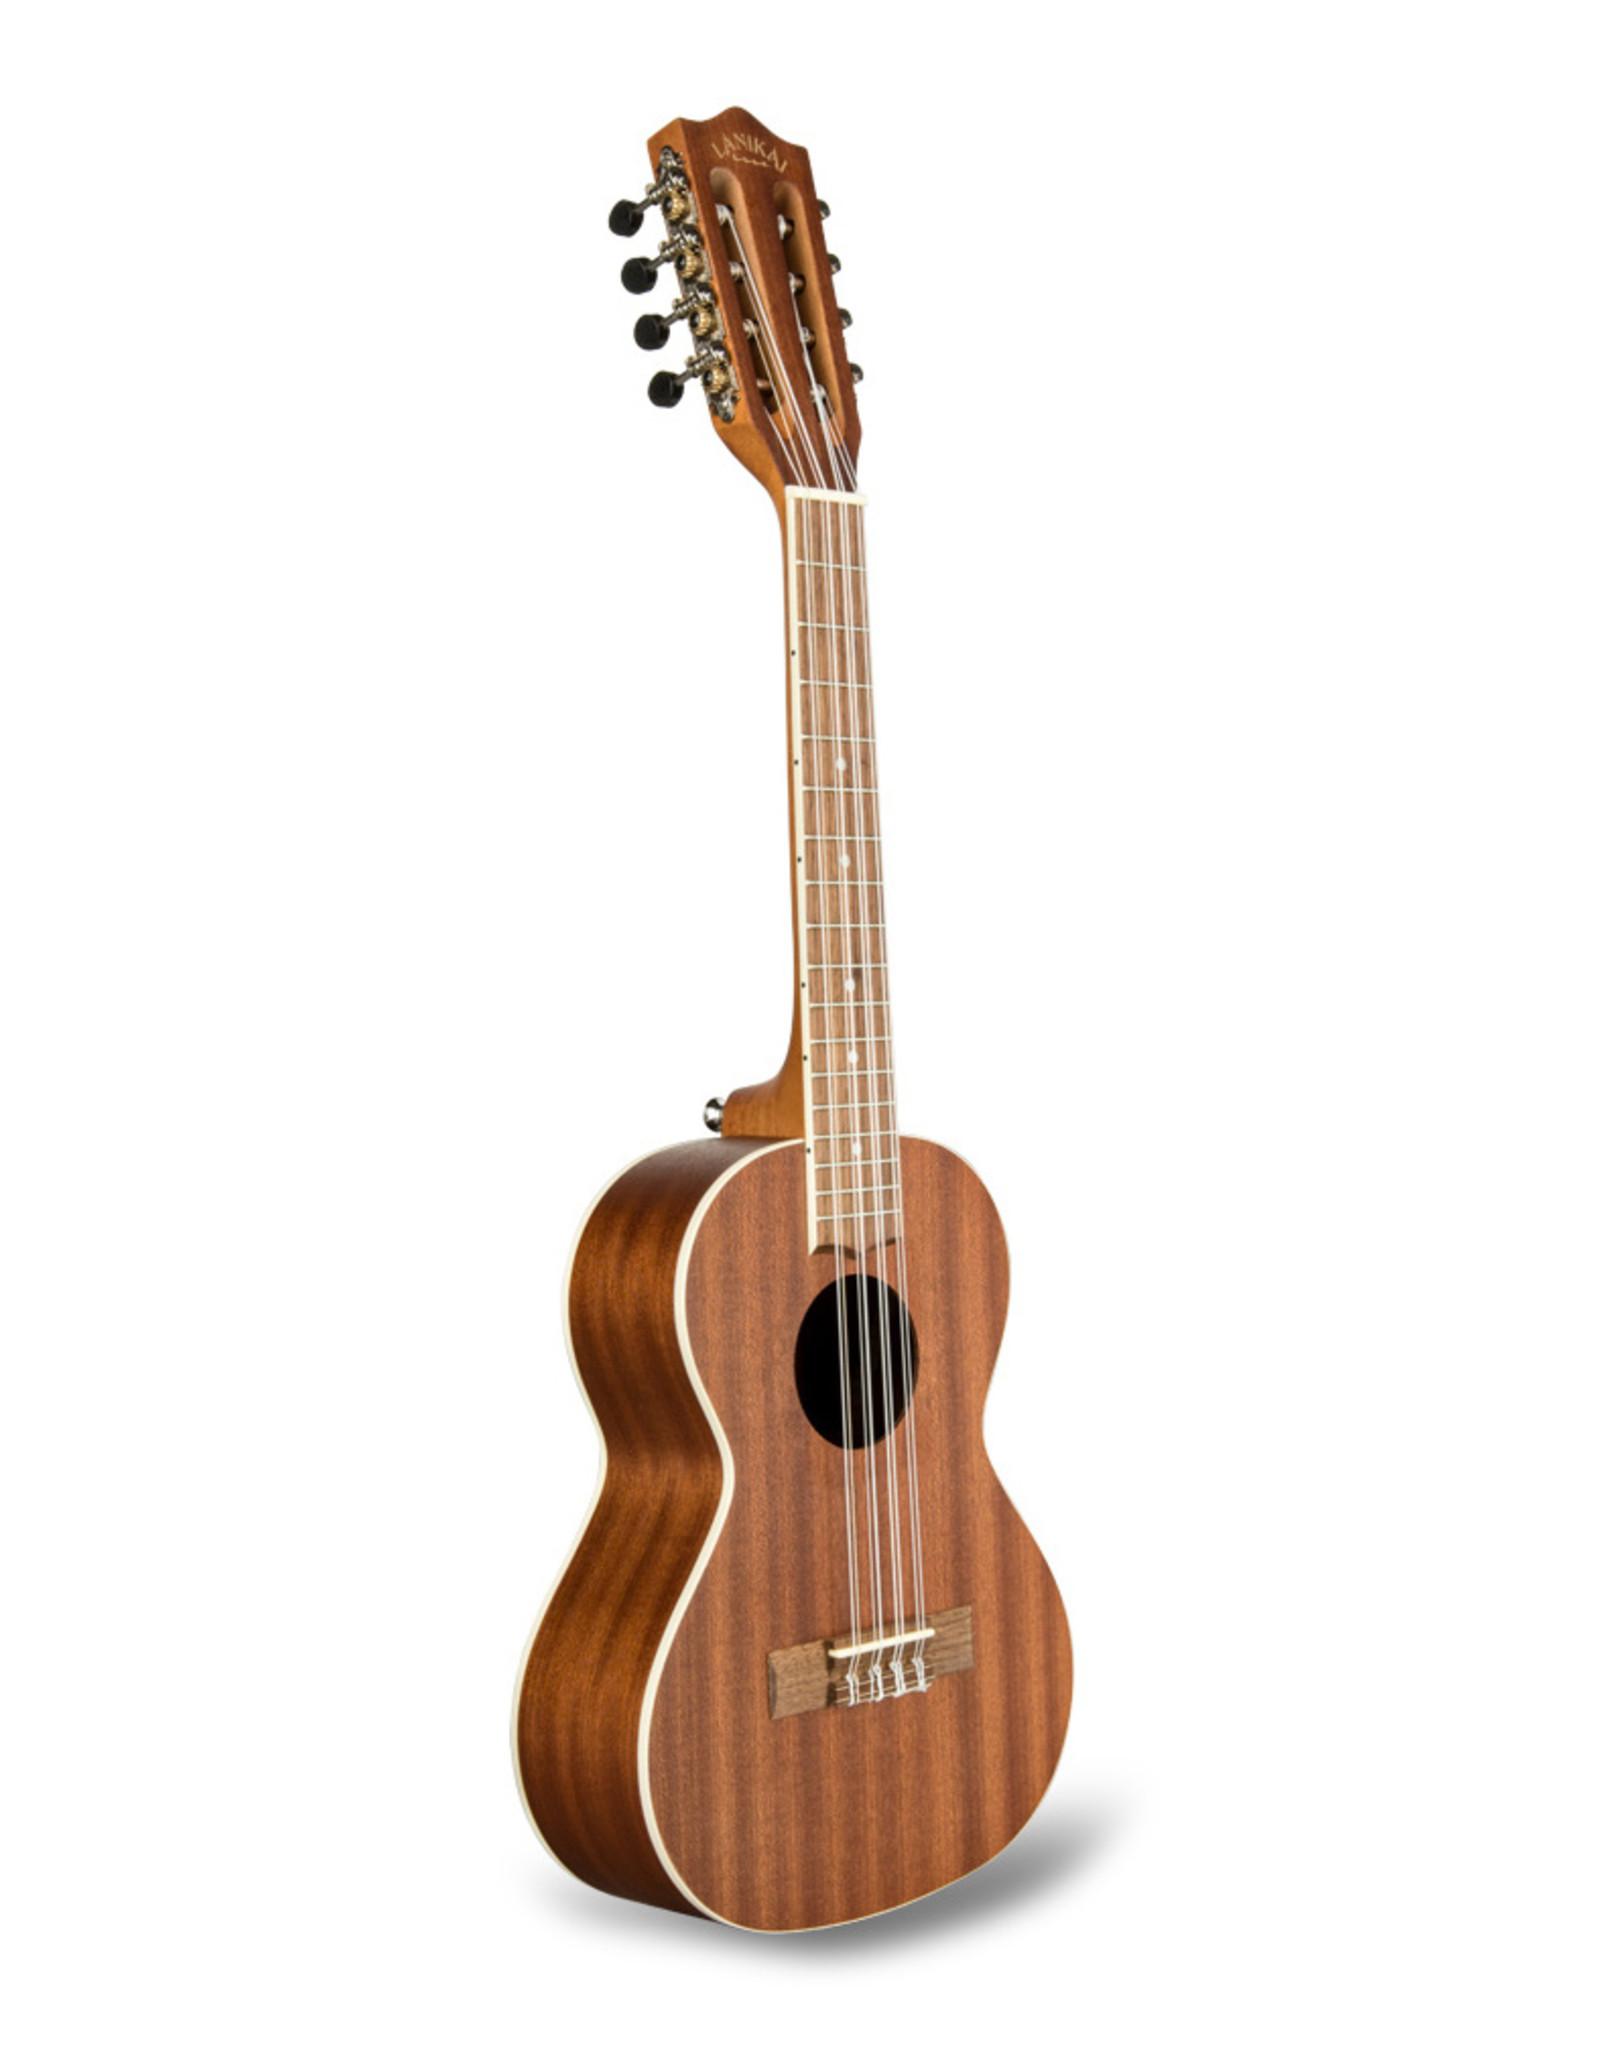 LANIKAI Lanikai Mahogany Tenor 8 String Uke